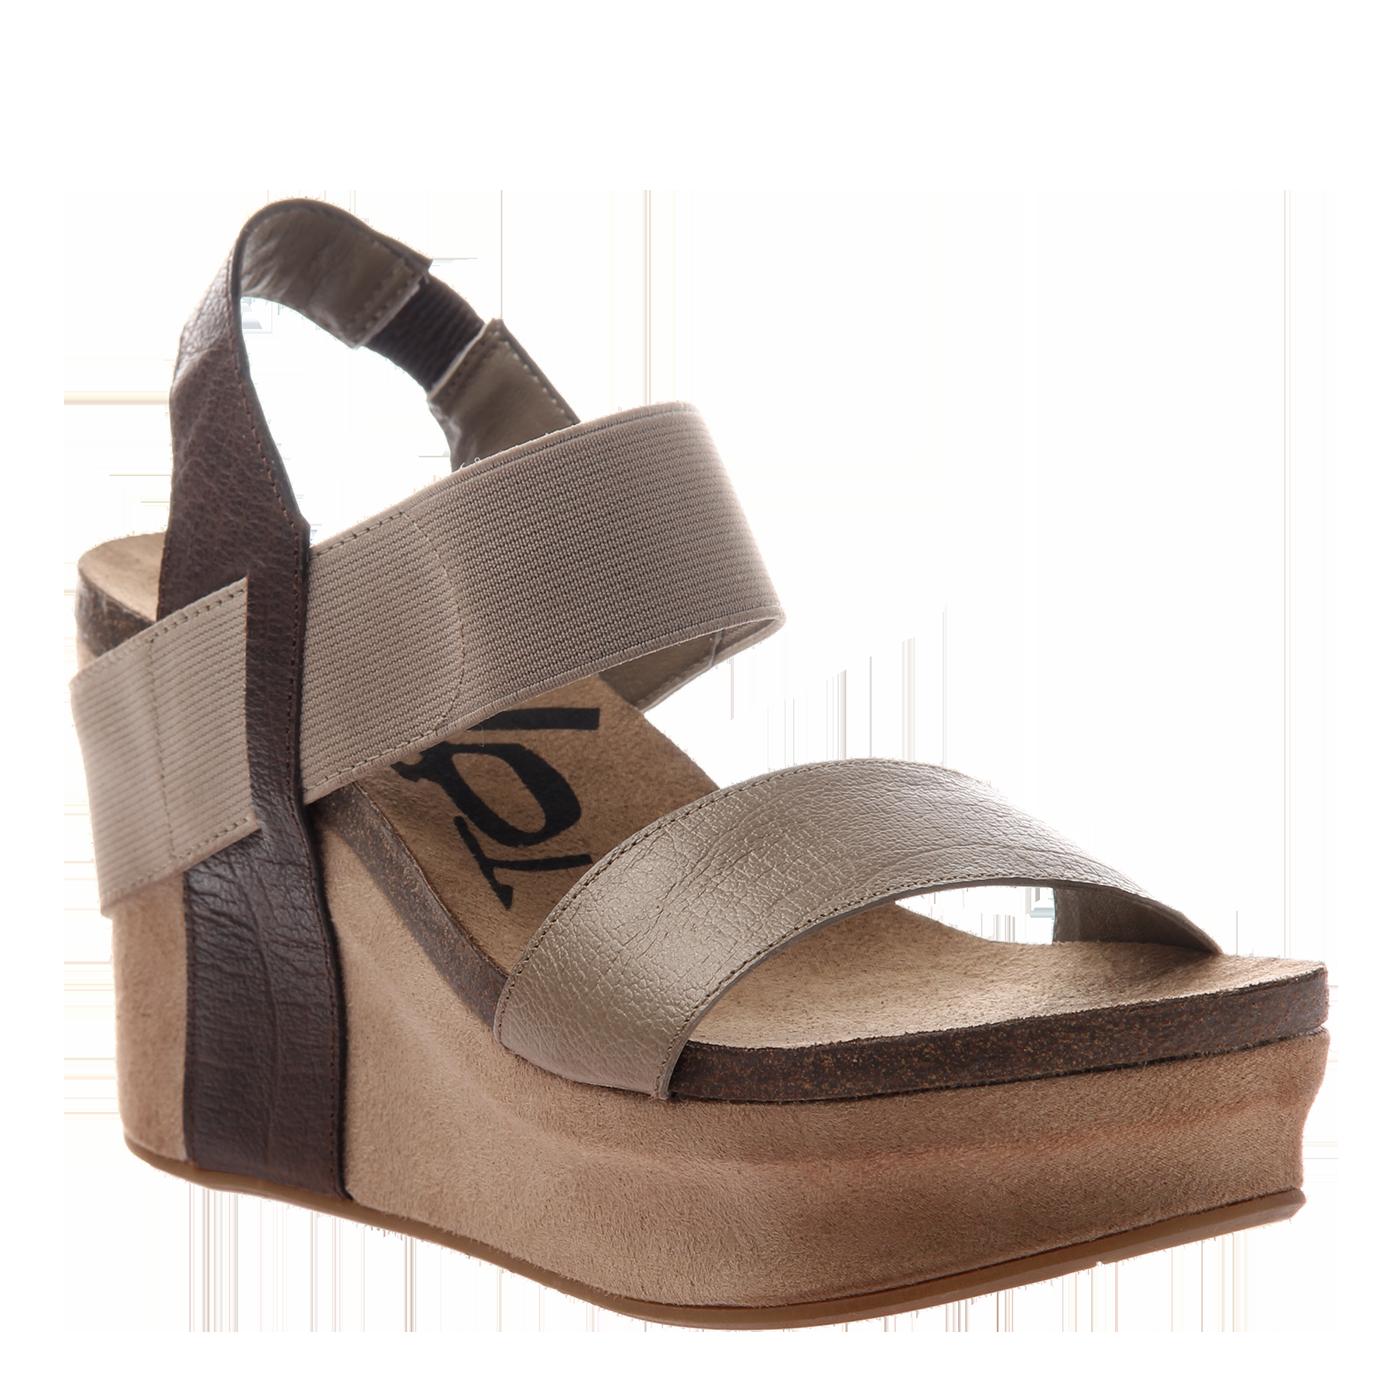 fdf28ff77 BUSHNELL in COFFEEBEAN Wedge Sandals